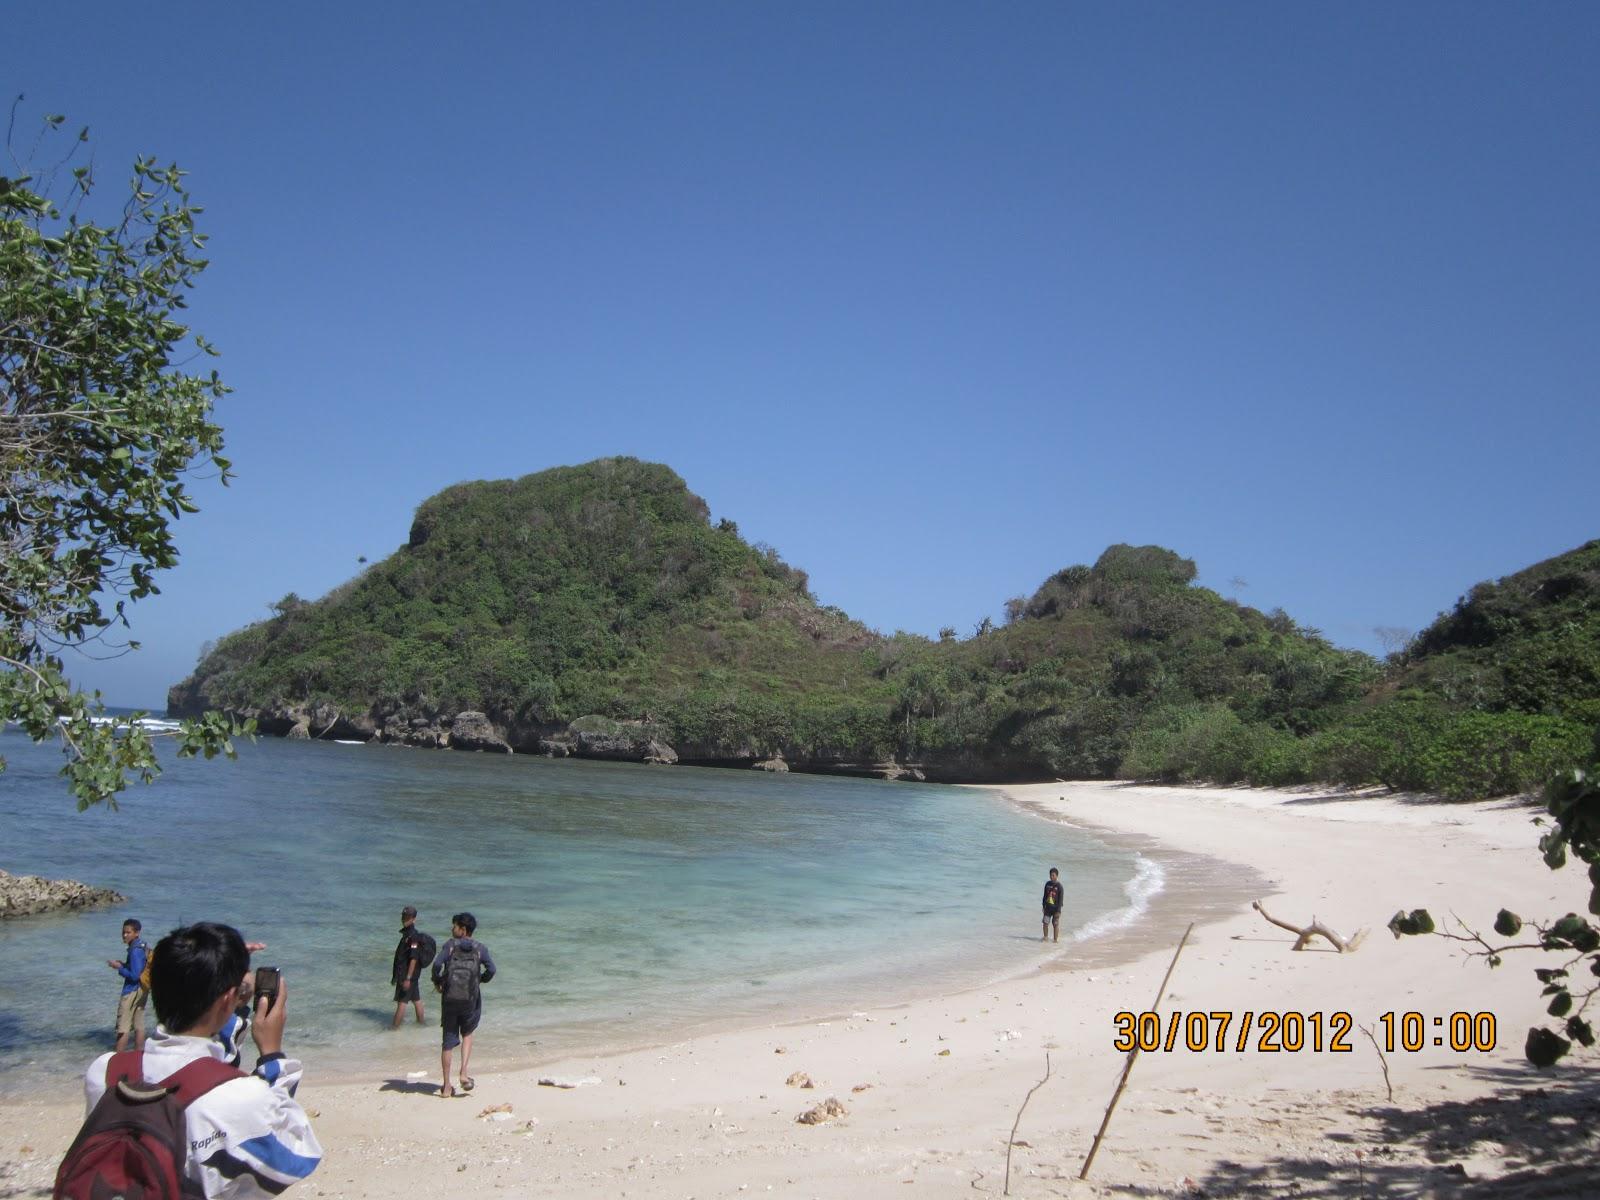 Pantai Clungup, Surga Tersembunyi di Lingkar Selatan ~ TRAVEL first ...